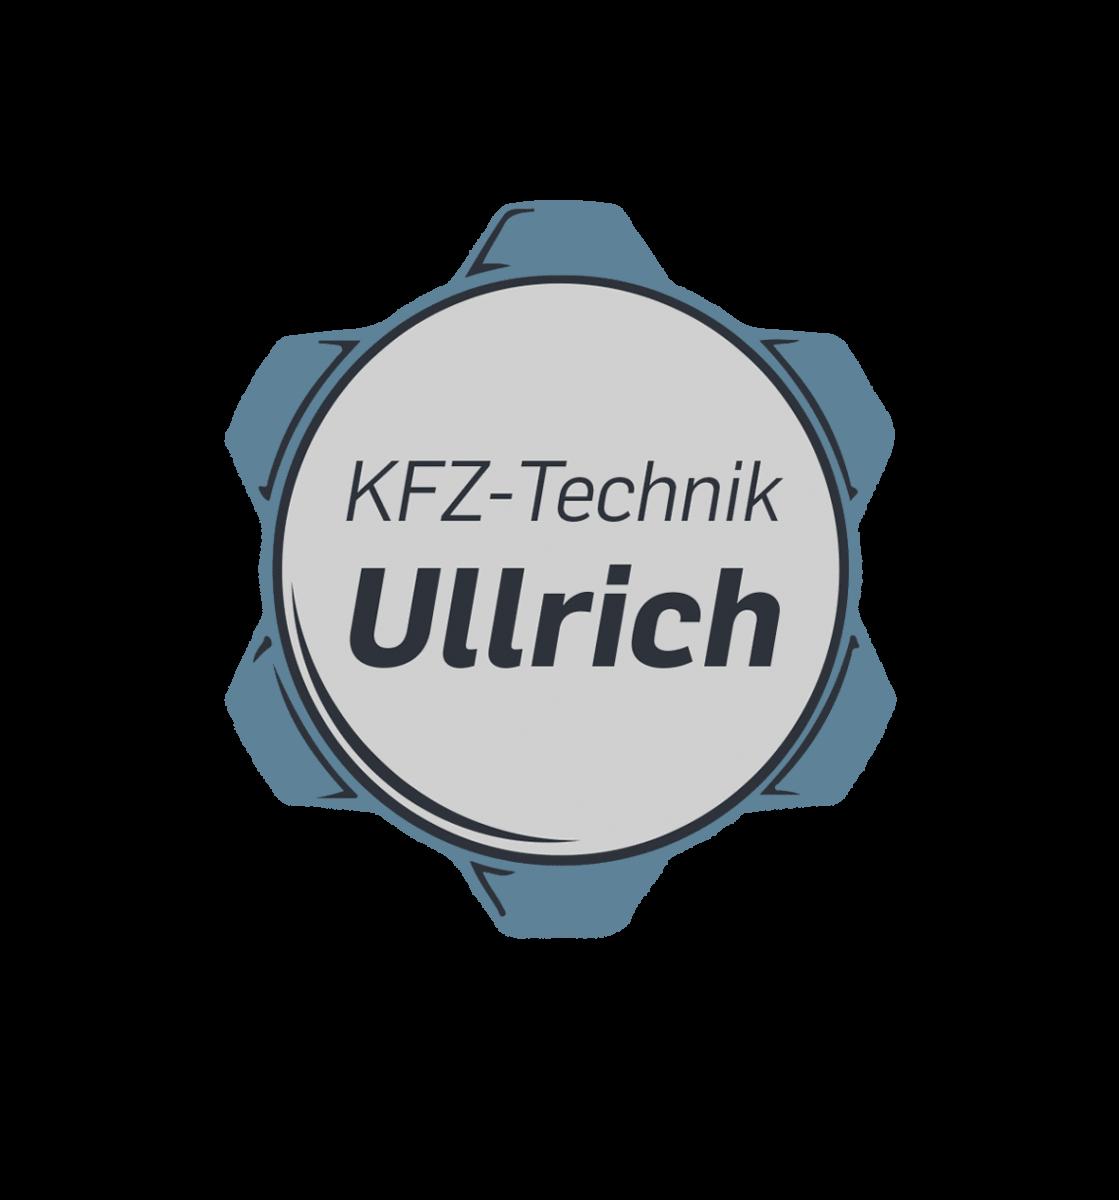 KFZ-Technik Ullrich